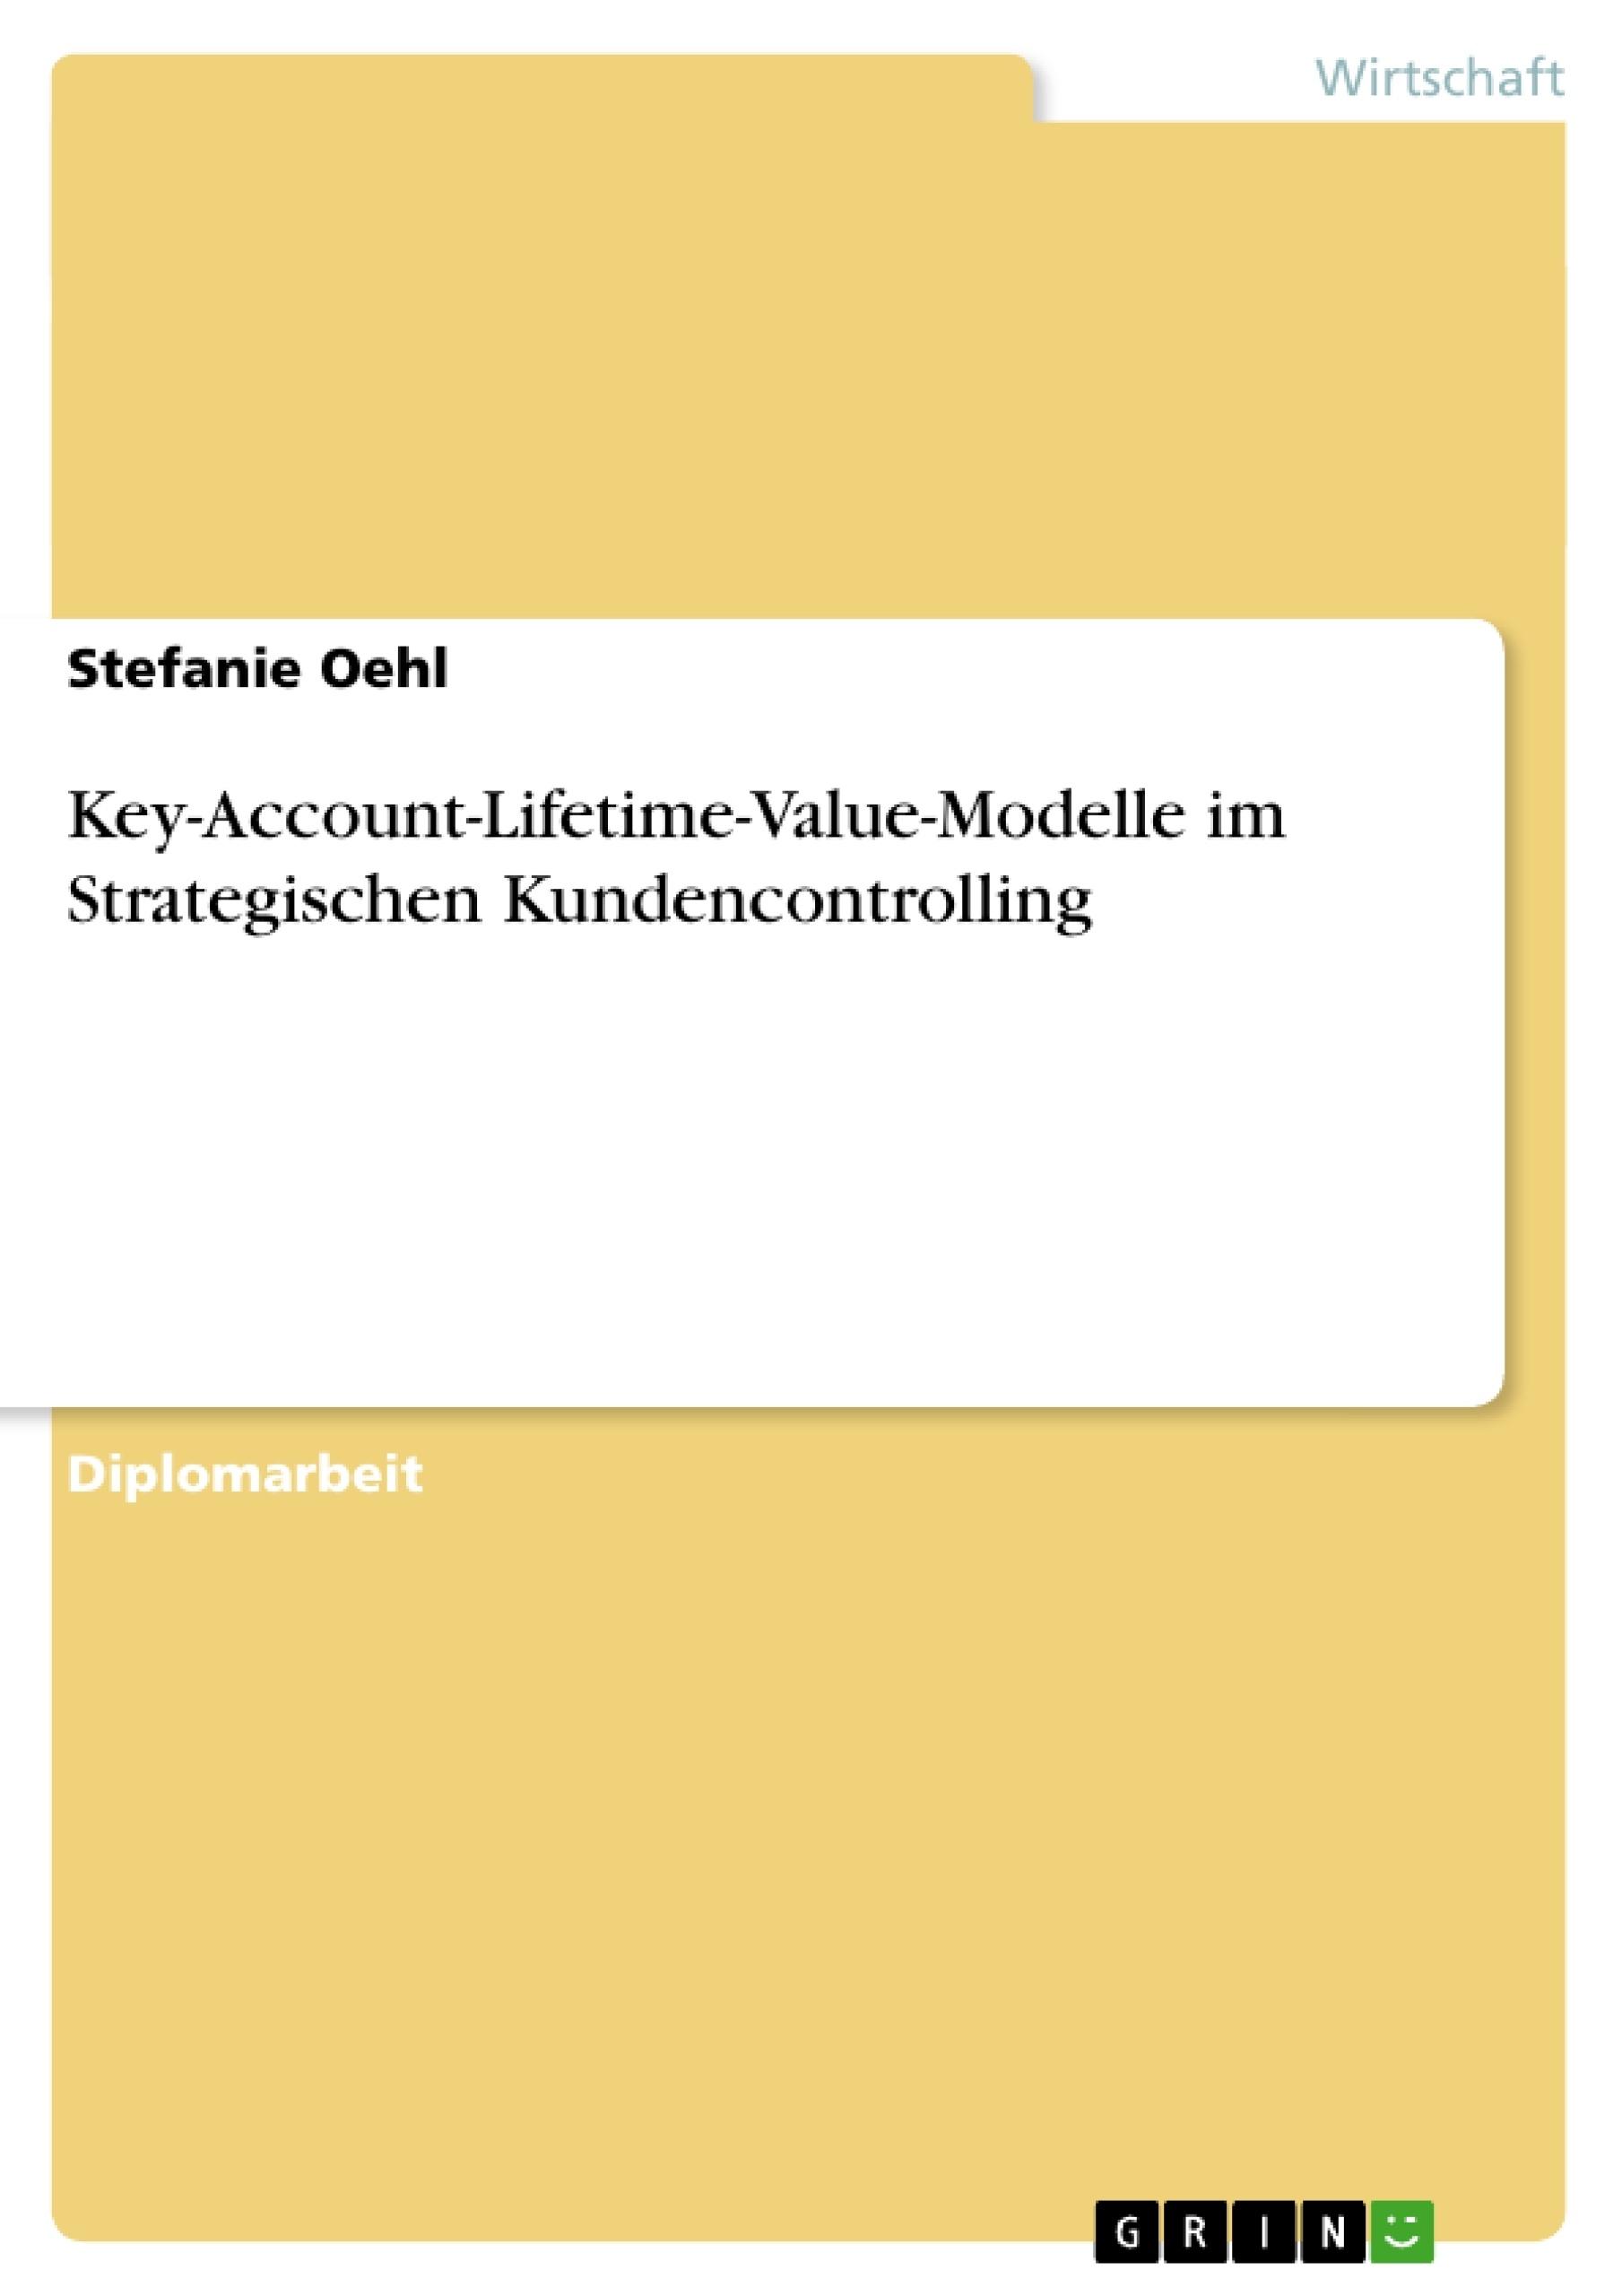 Titel: Key-Account-Lifetime-Value-Modelle im Strategischen Kundencontrolling